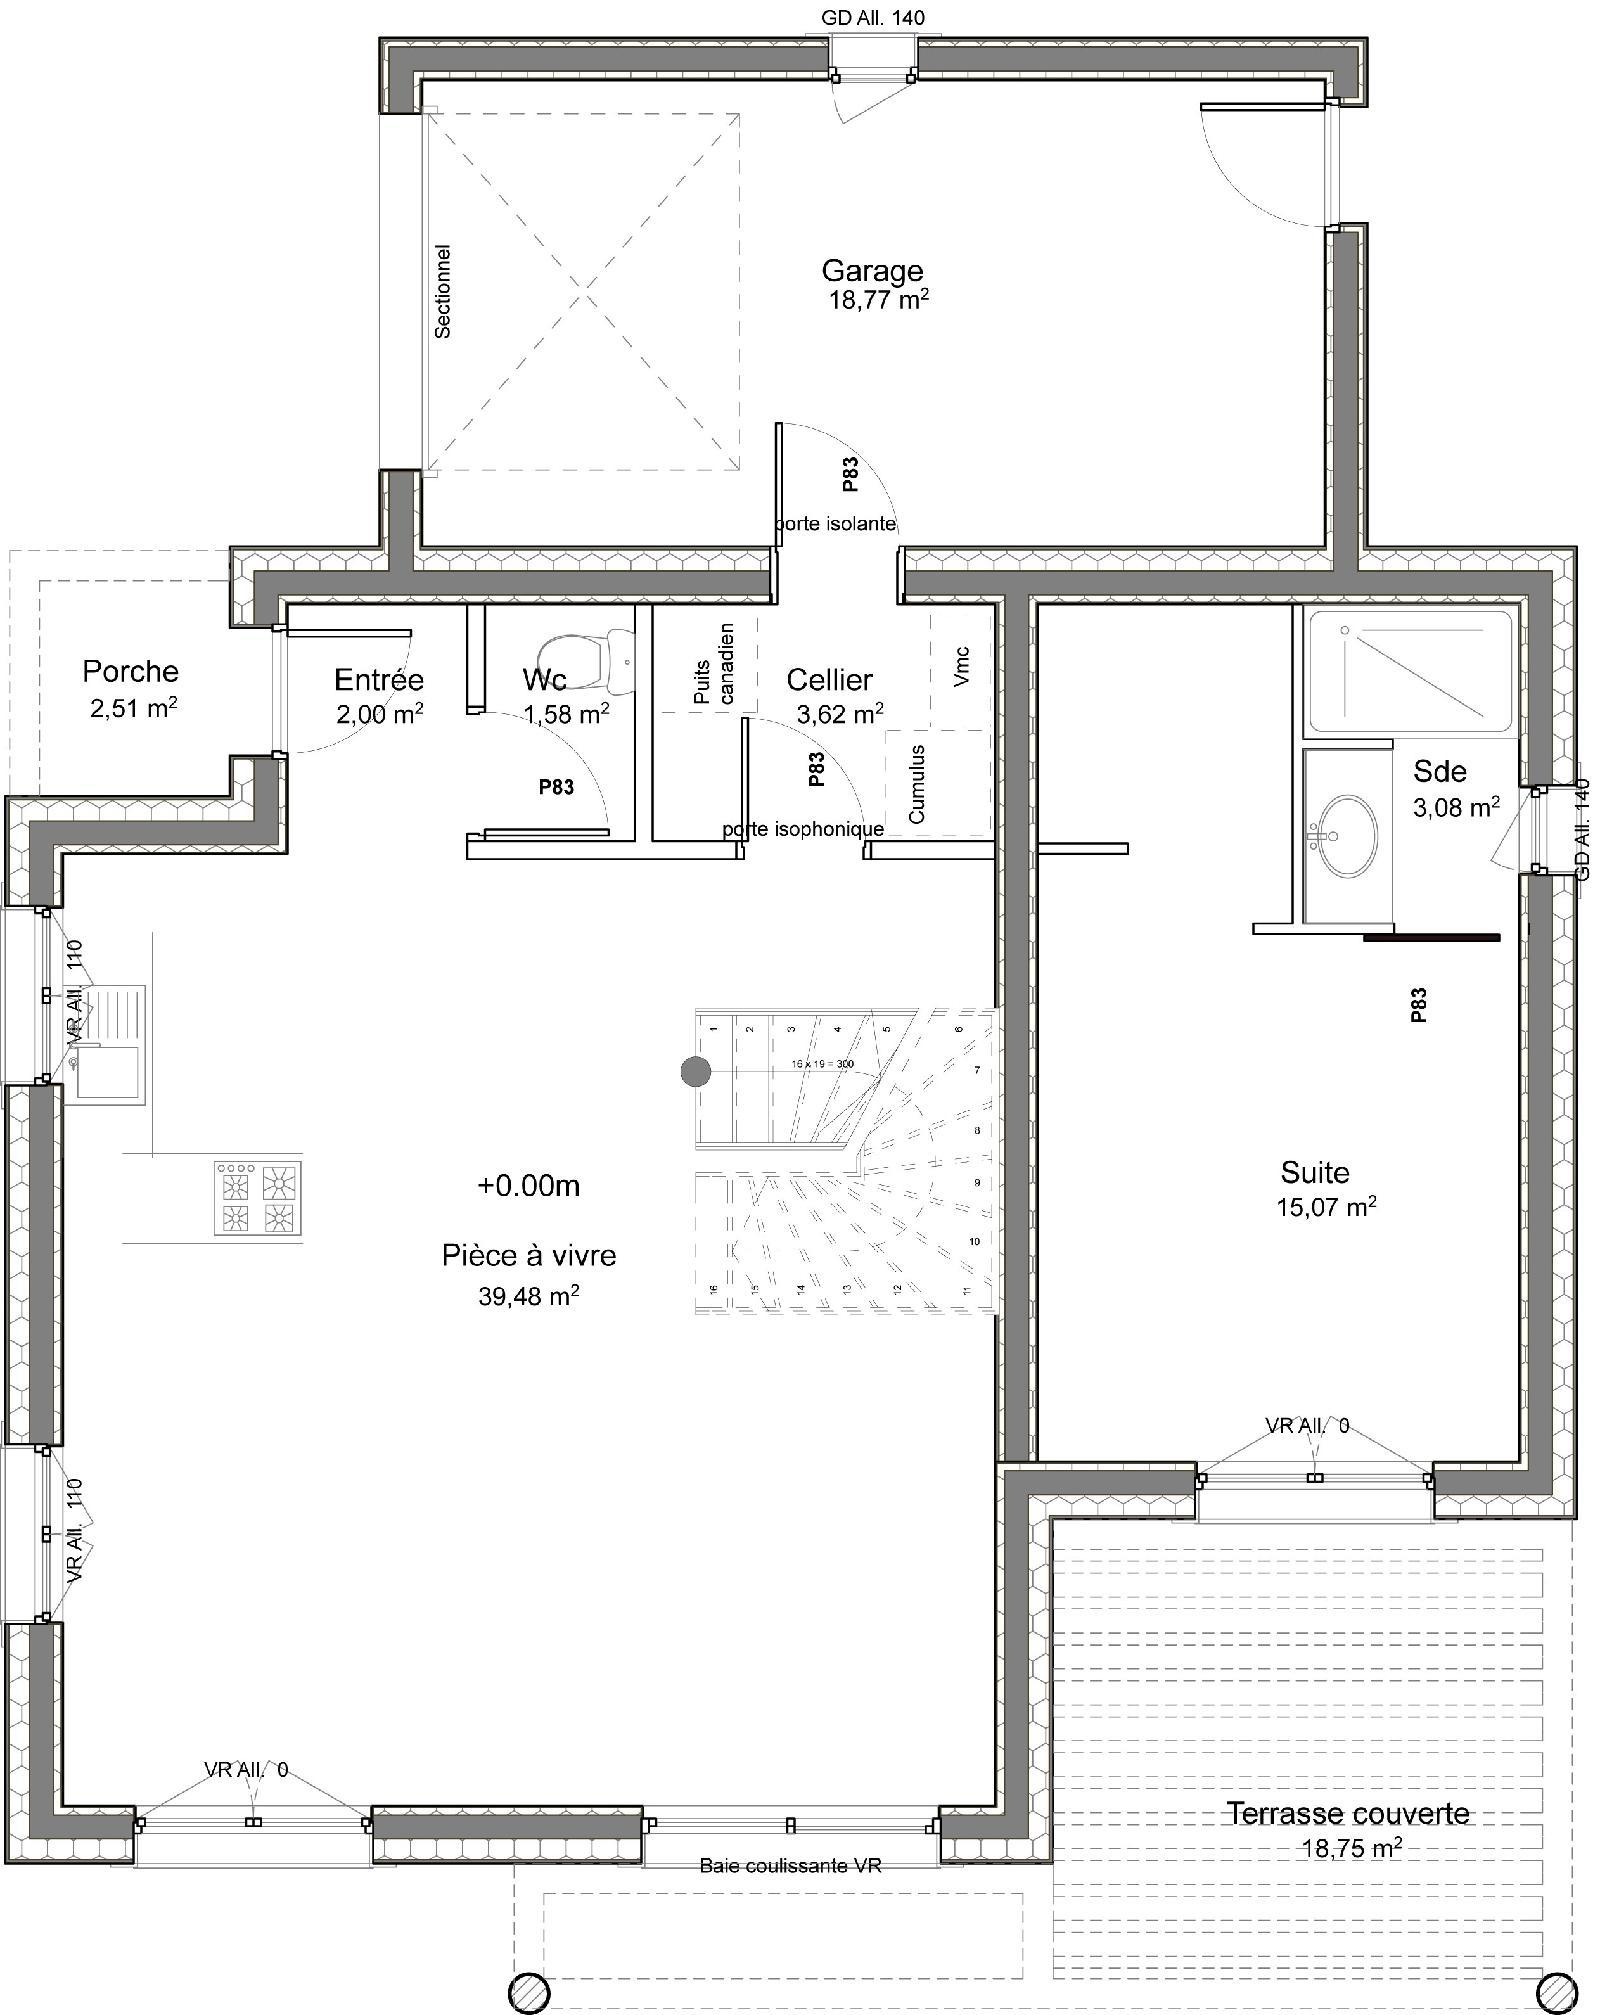 De casas de campo bonitas modernas planos de casas de dos - Planos de casas de 2 plantas ...